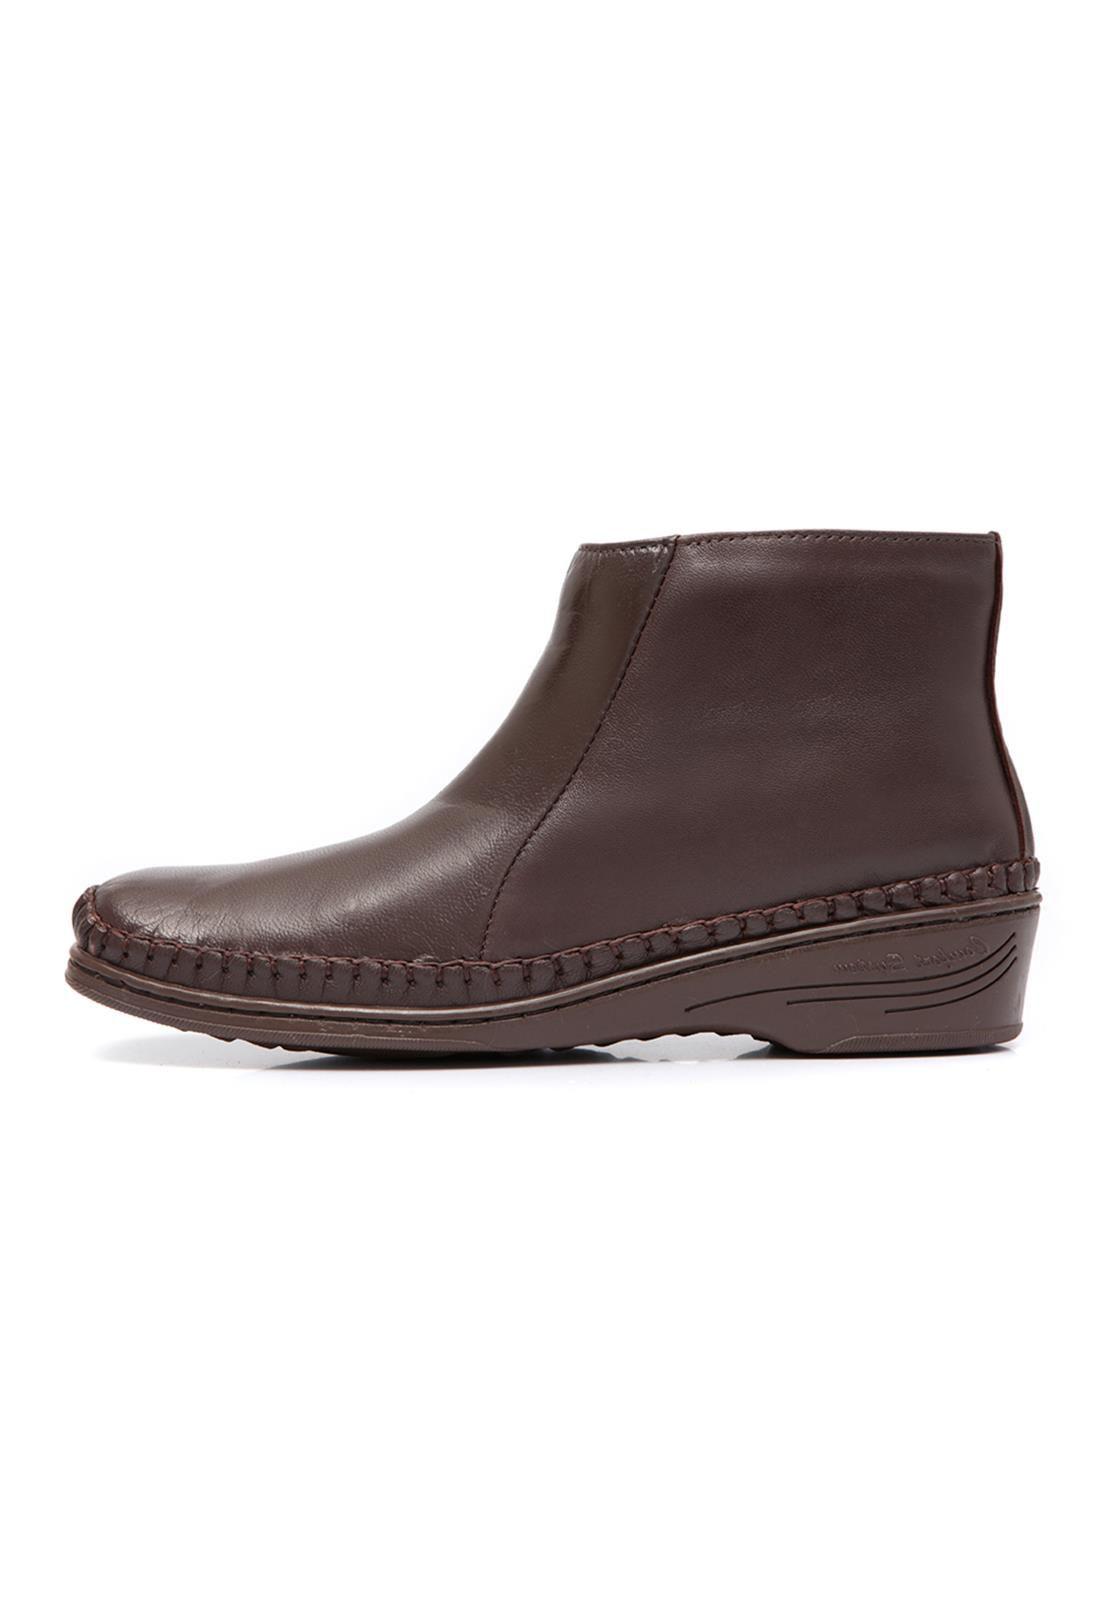 Bota MagerShoes em Couro B10 - Cores